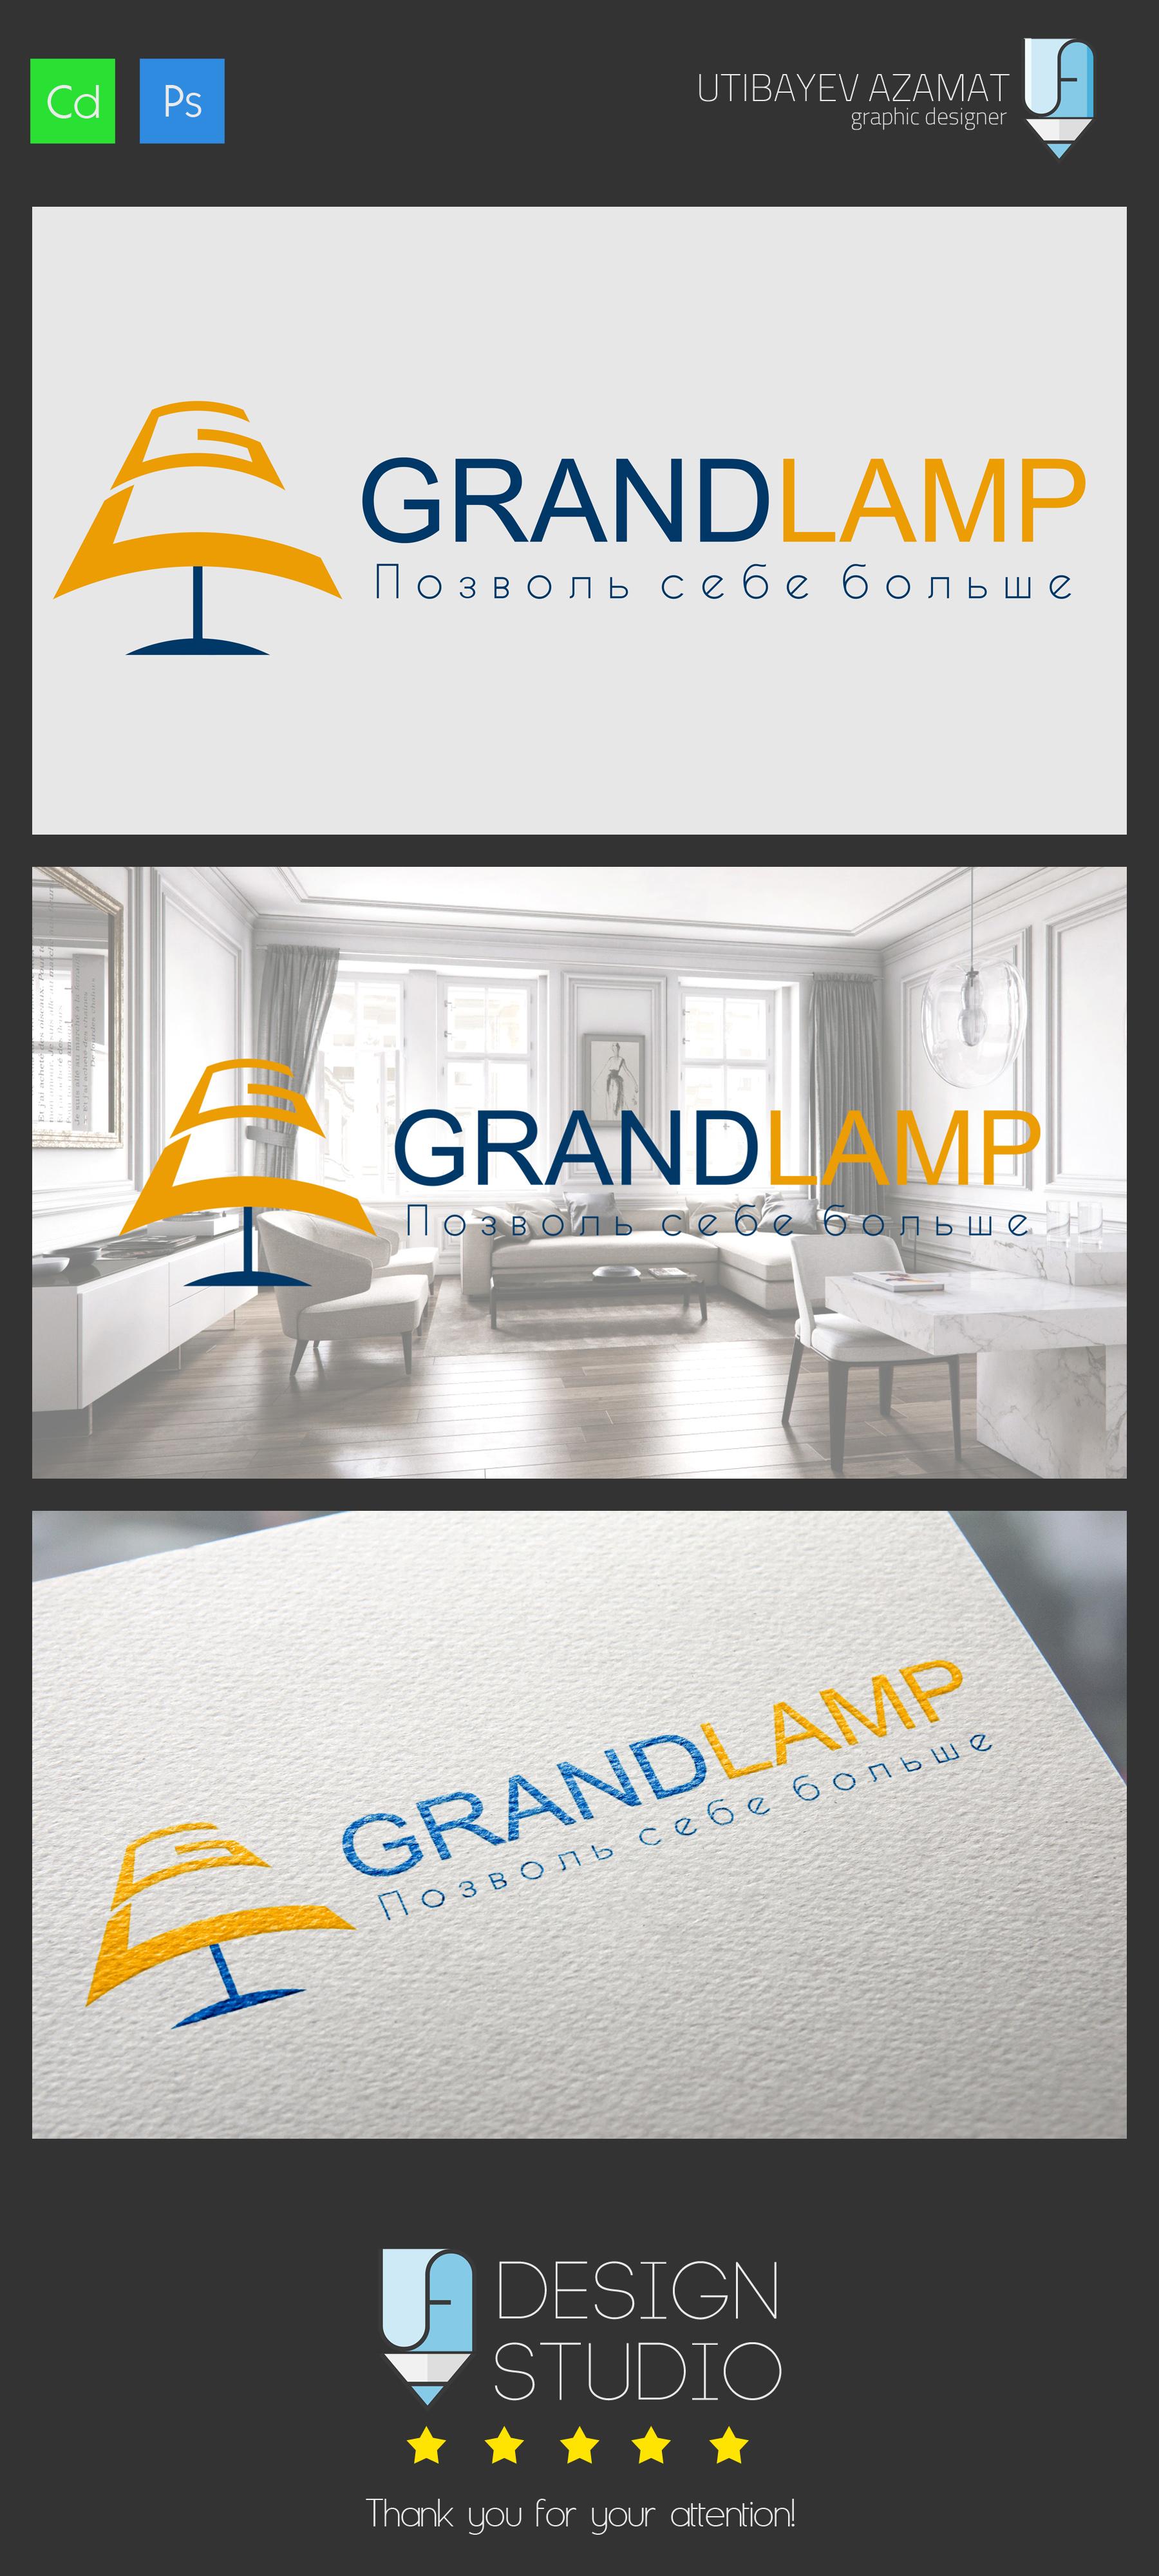 Разработка логотипа и элементов фирменного стиля фото f_56557de8f0111a4c.jpg